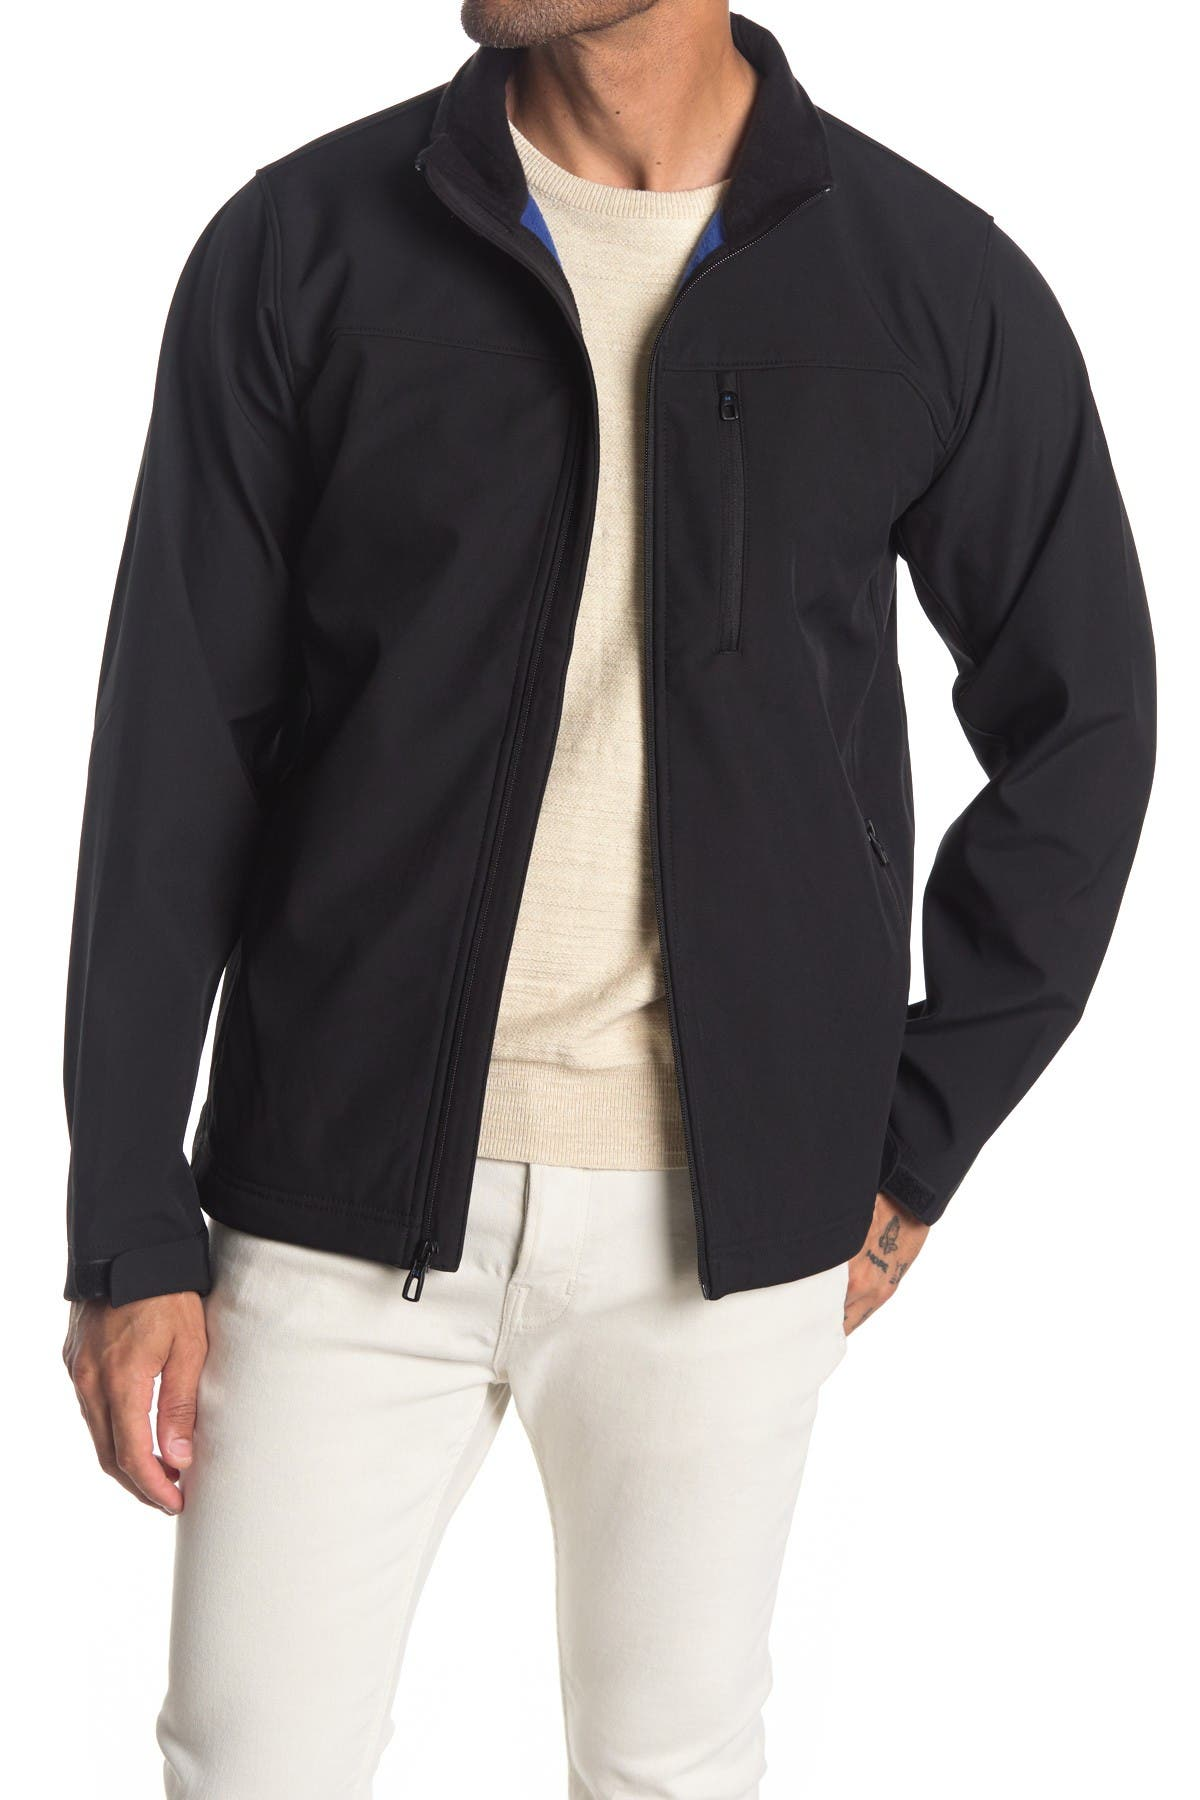 Image of Hawke & Co. Midweight Softshell Zip Jacket